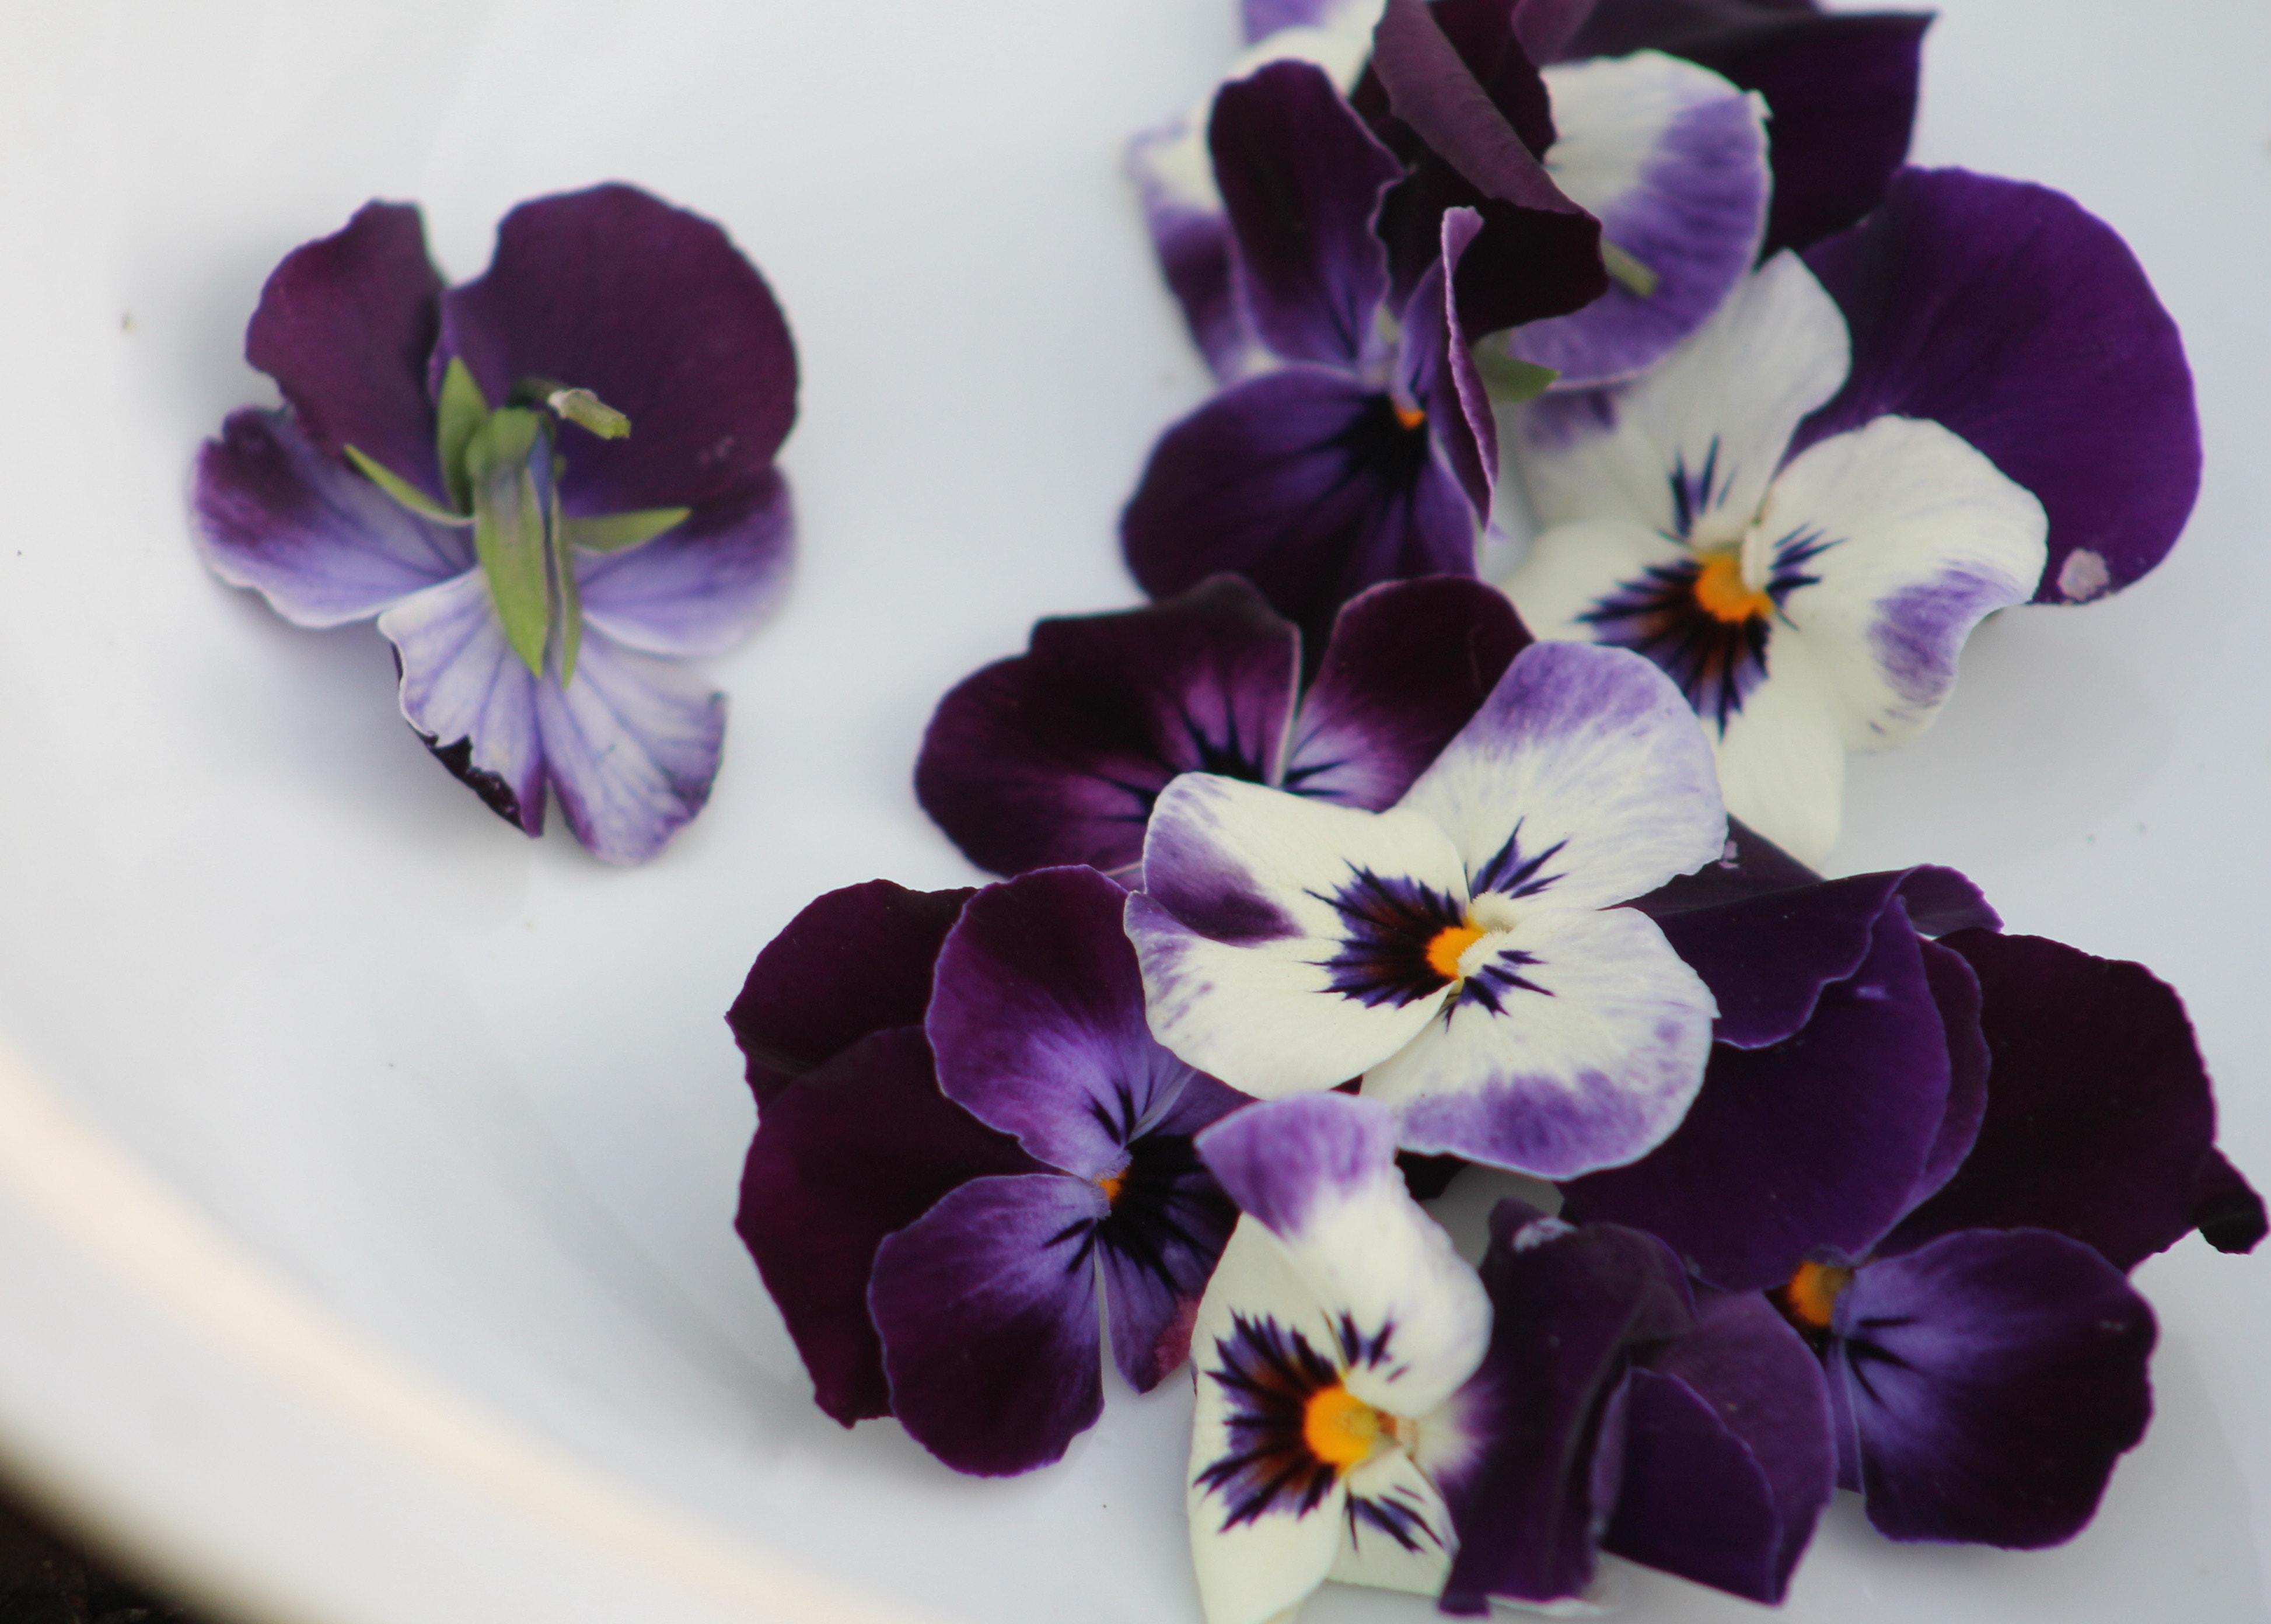 mix of light and dark purple violets